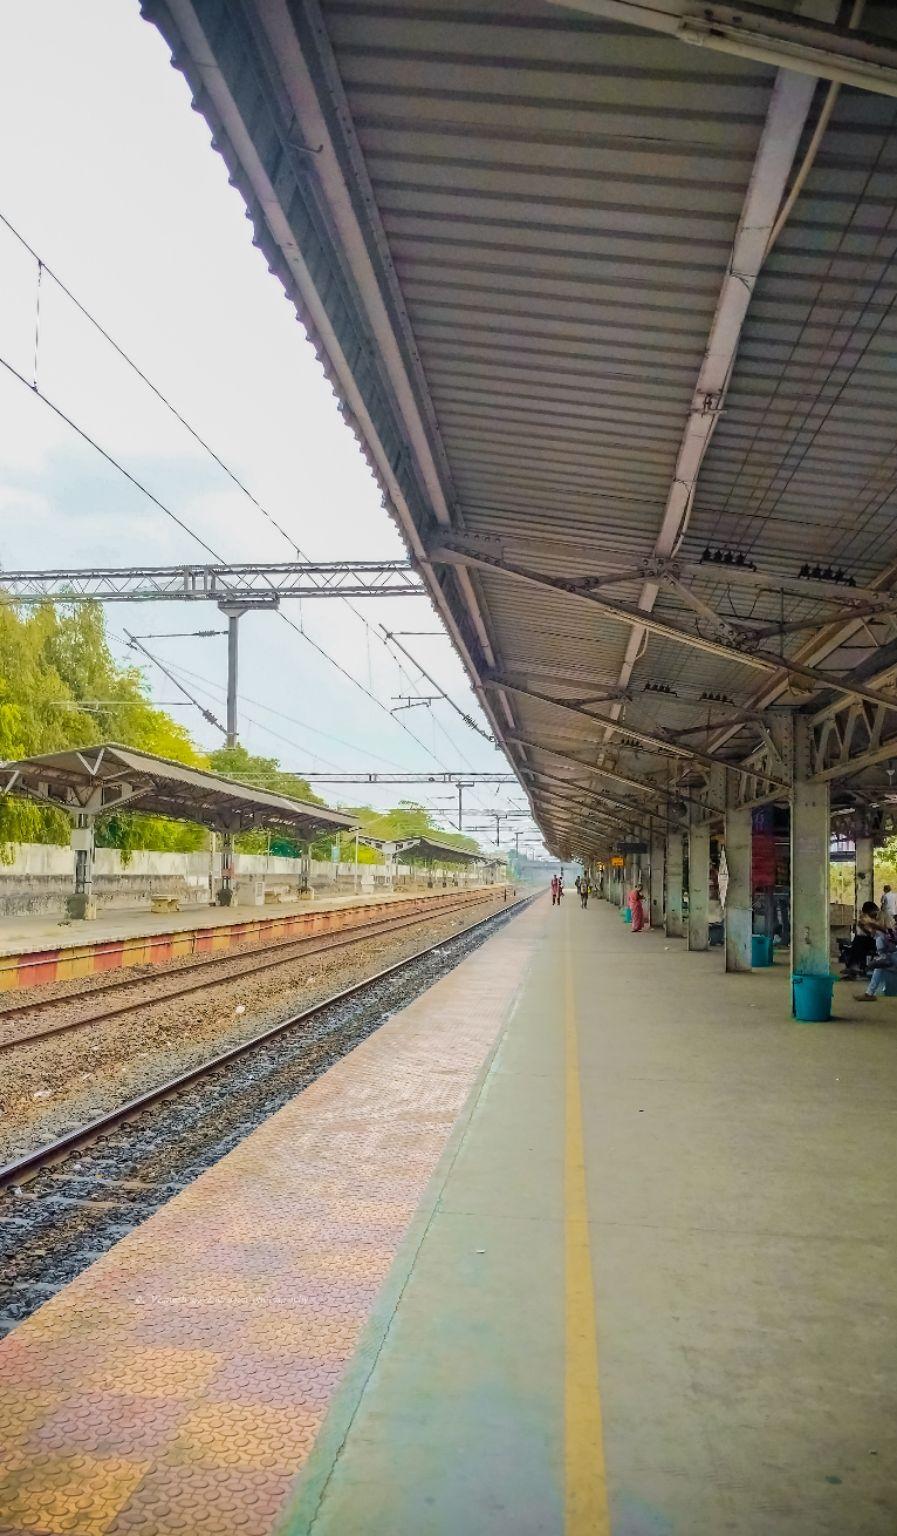 Photo of Chromepet Railway Station Road By Viki Walker